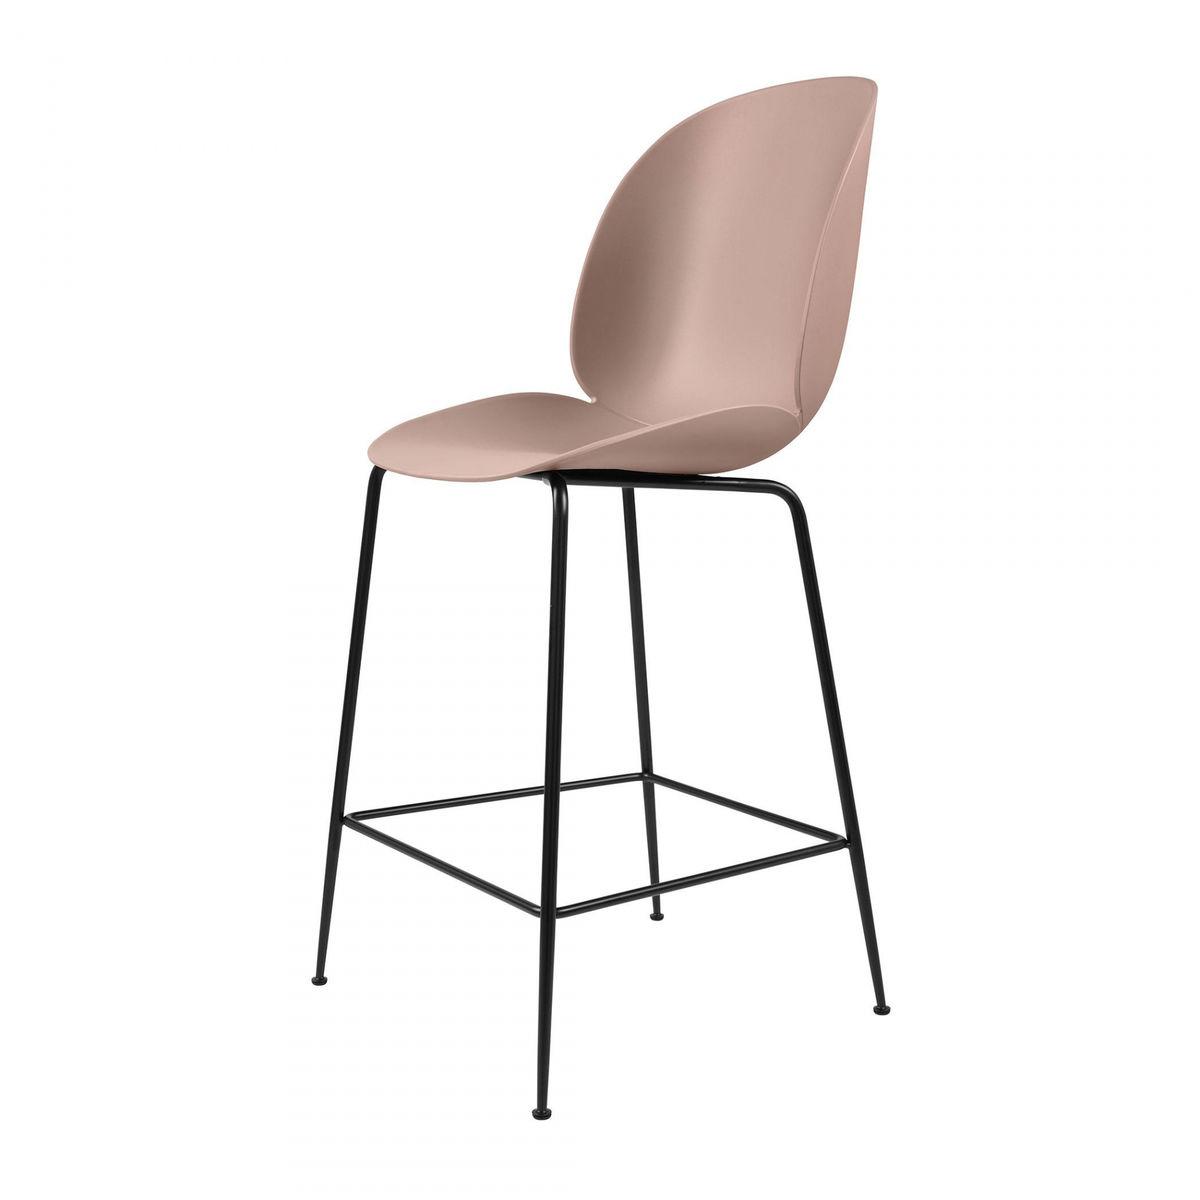 Beetle counter chair barhocker schwarz 108cm gubi for Barhocker pink